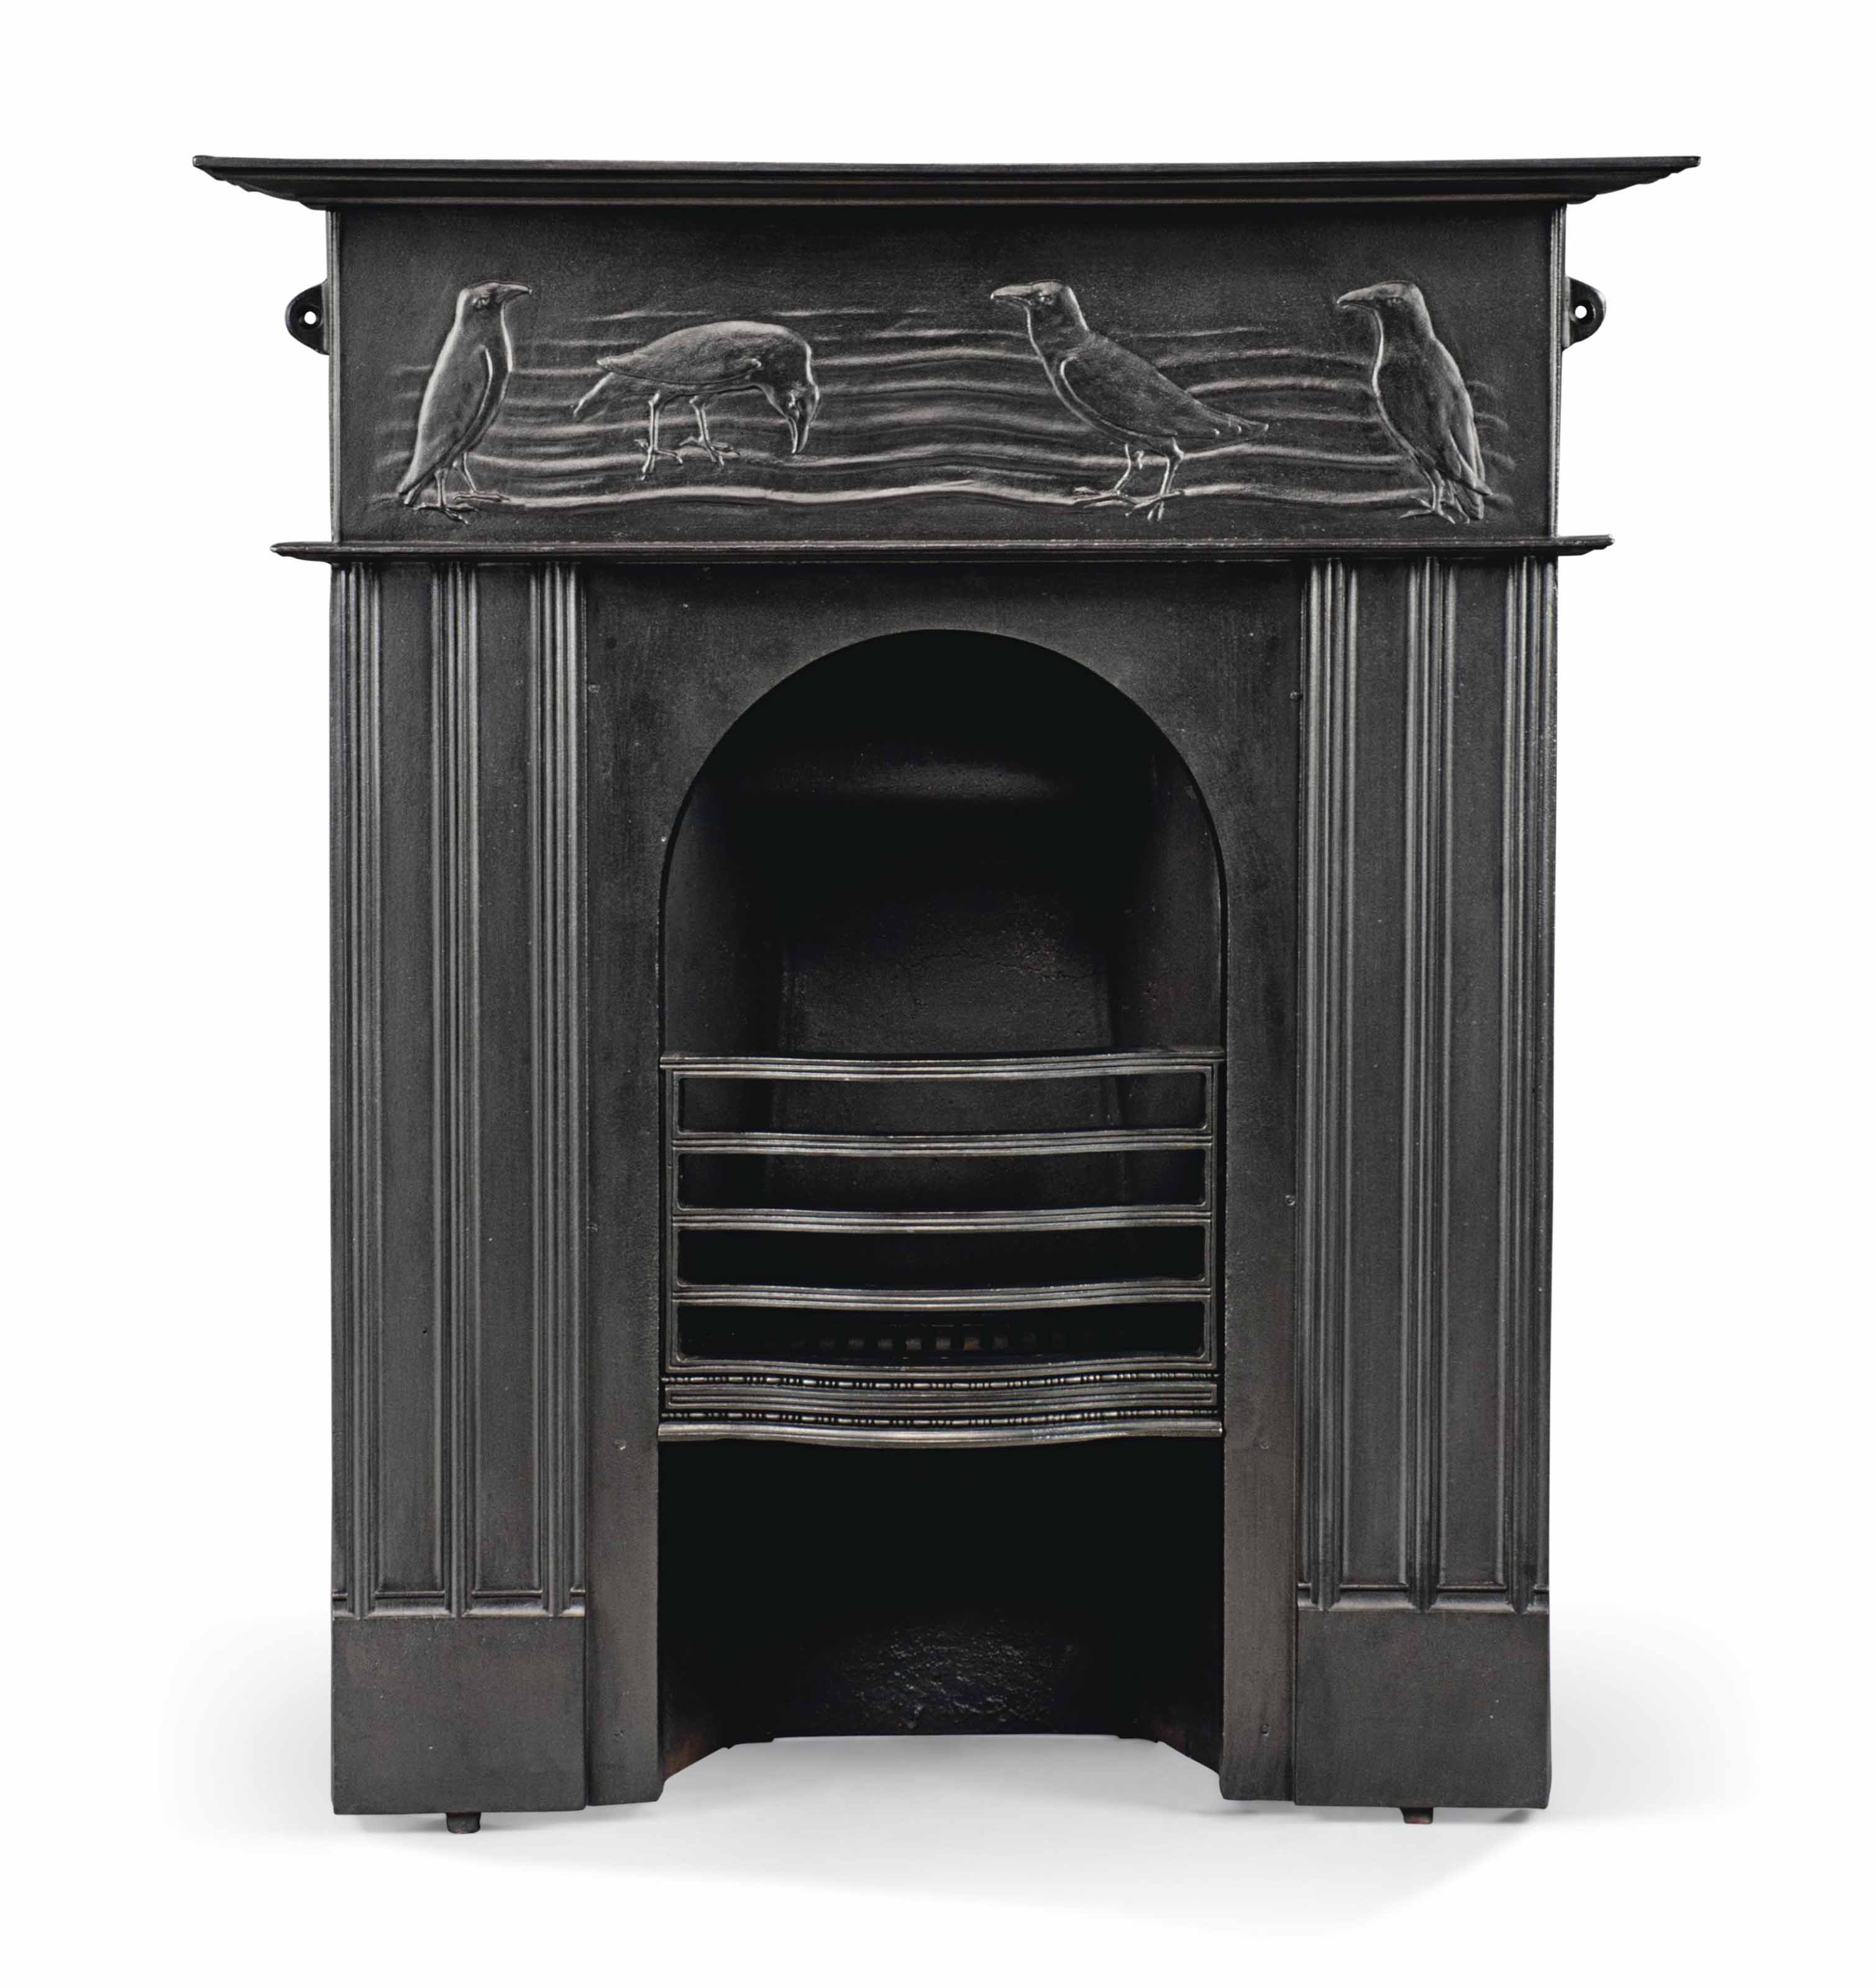 A C. F. A. VOYSEY (1857-1941) CAST-IRON FIRE-SURROUND